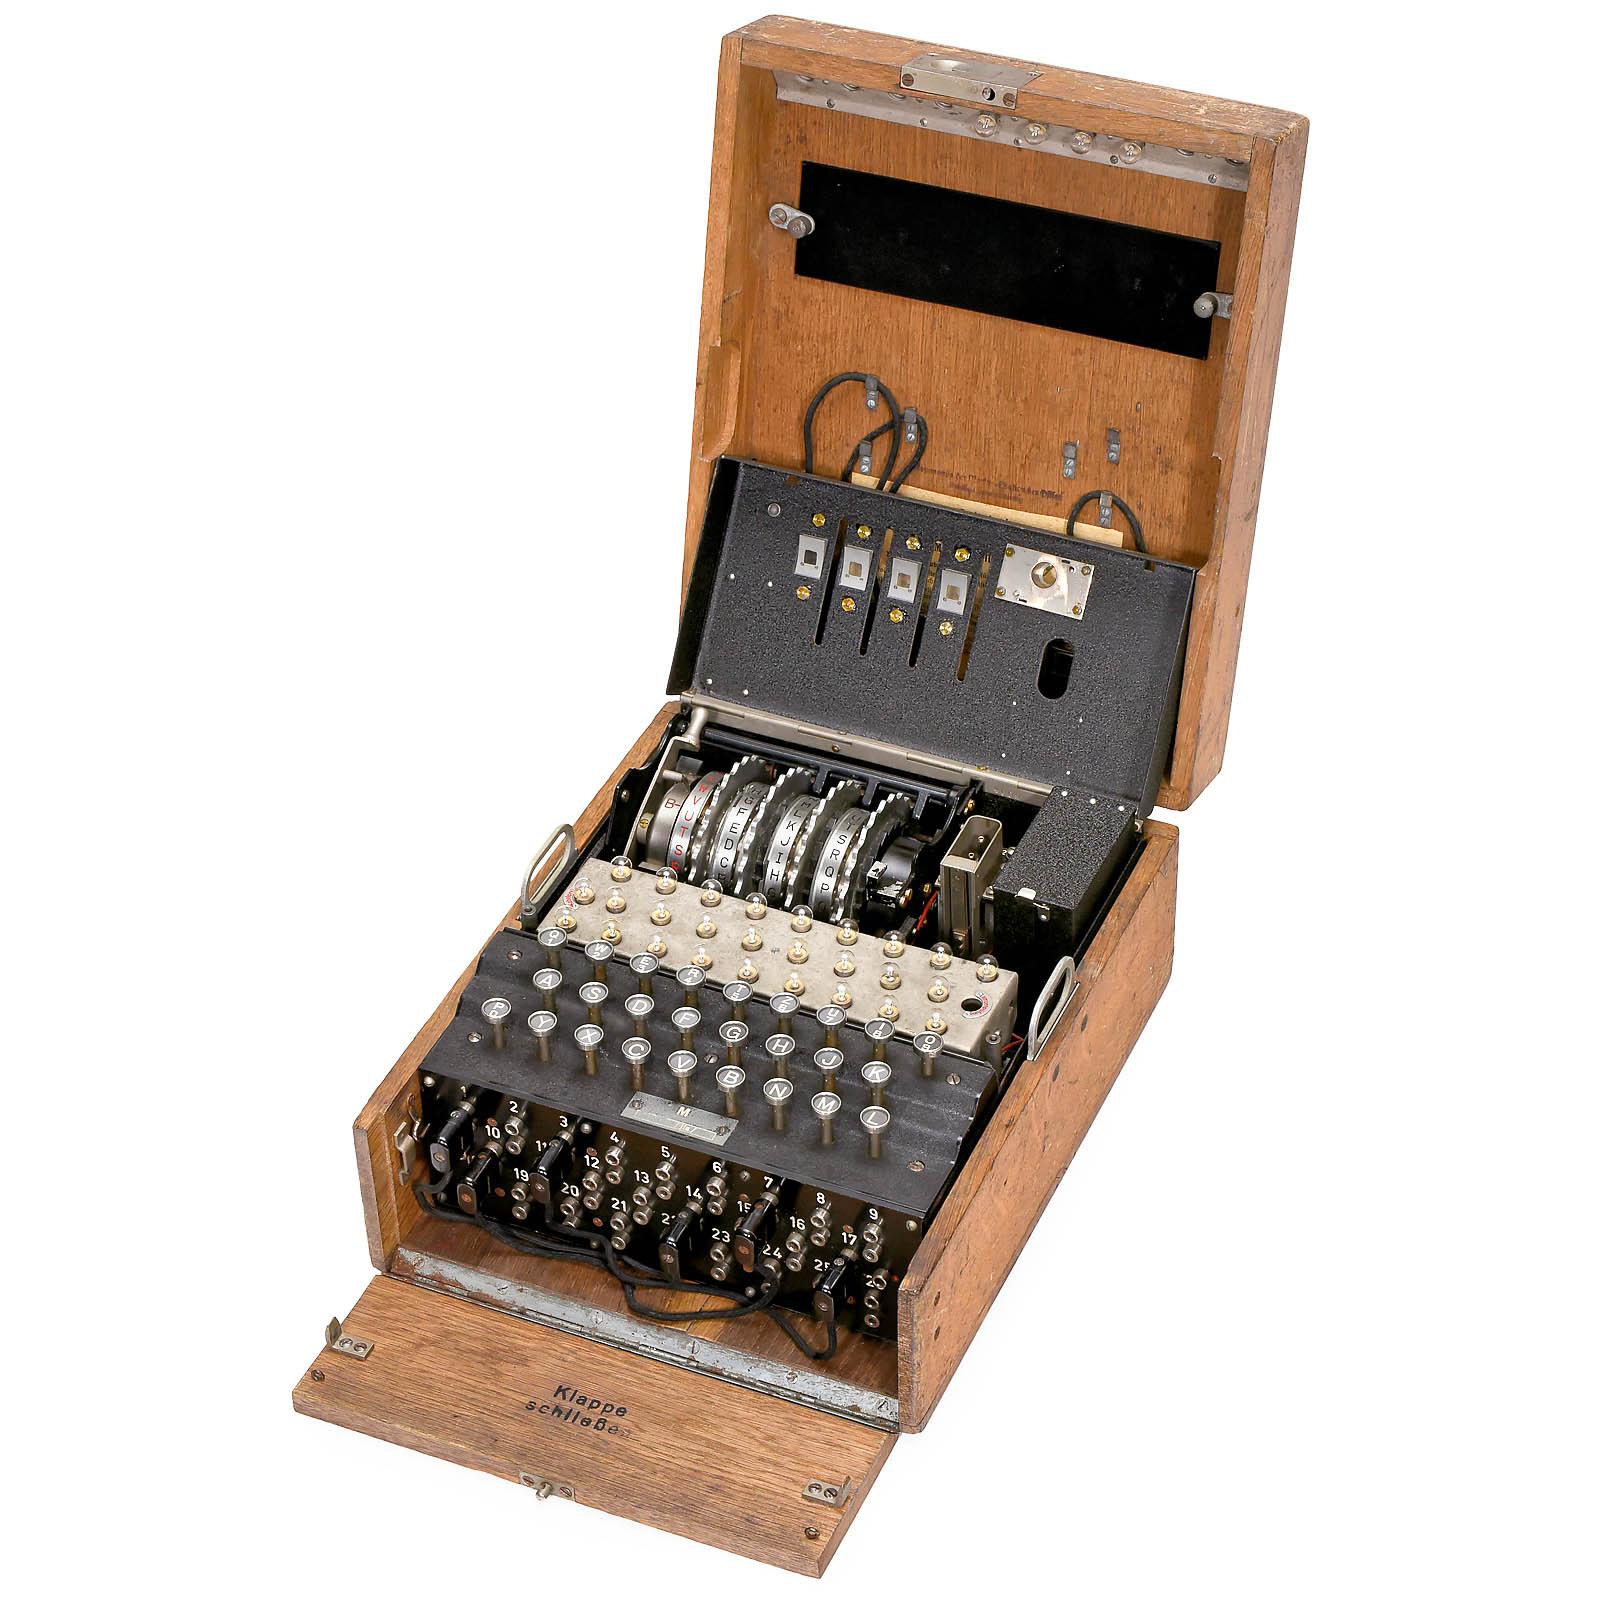 """Enigma M4"" Cypher Machine, c. 1942 4-rotor naval Enigma ..."